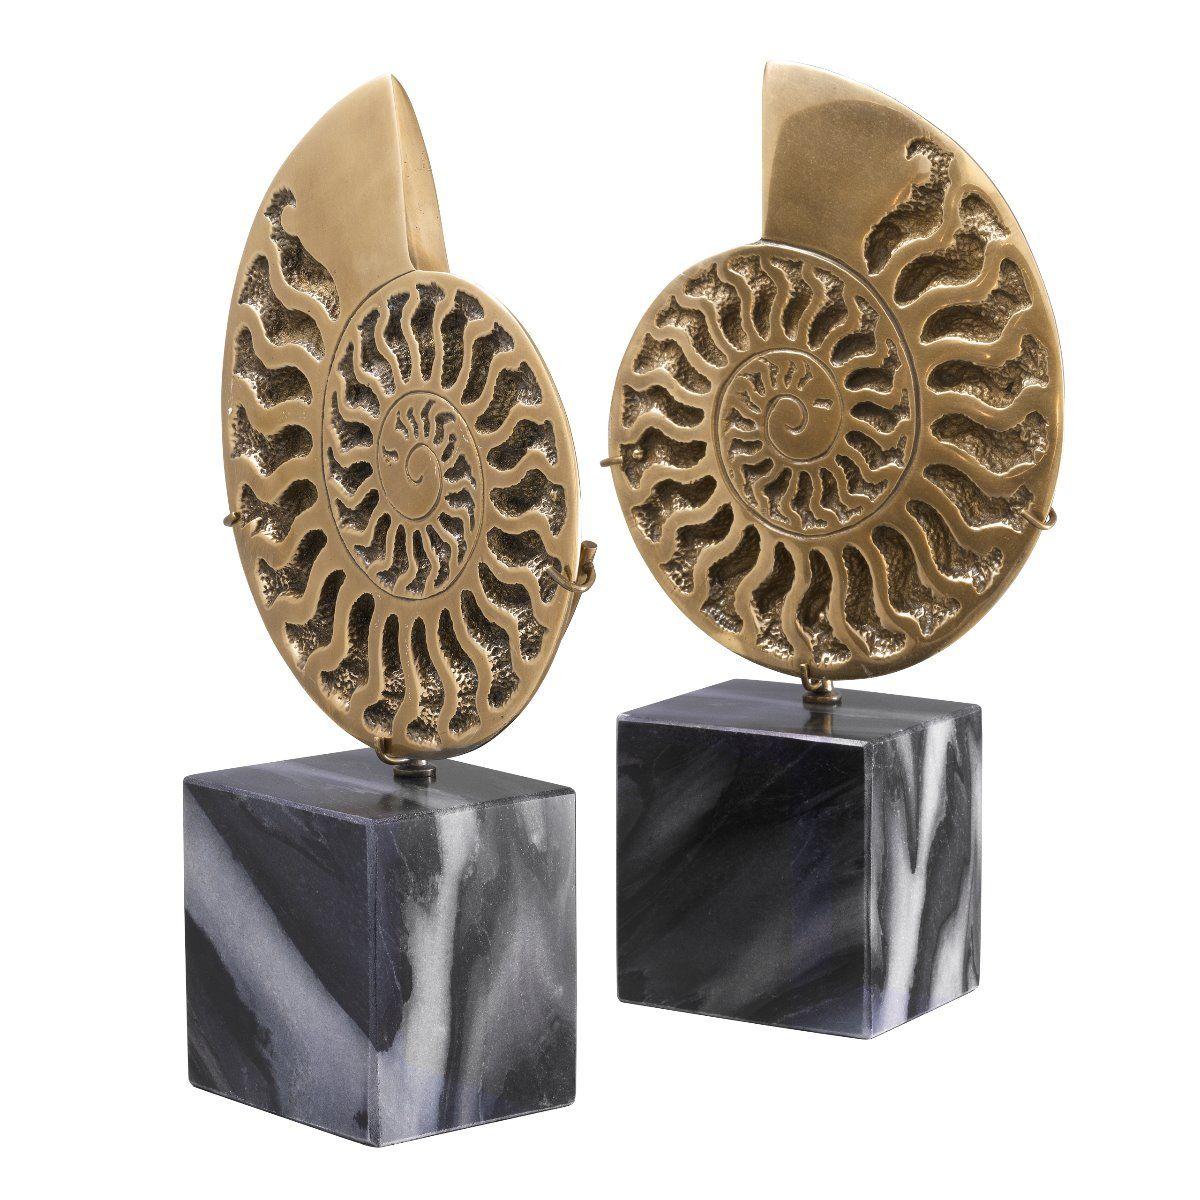 object-Ammonite-Eichholtz-3